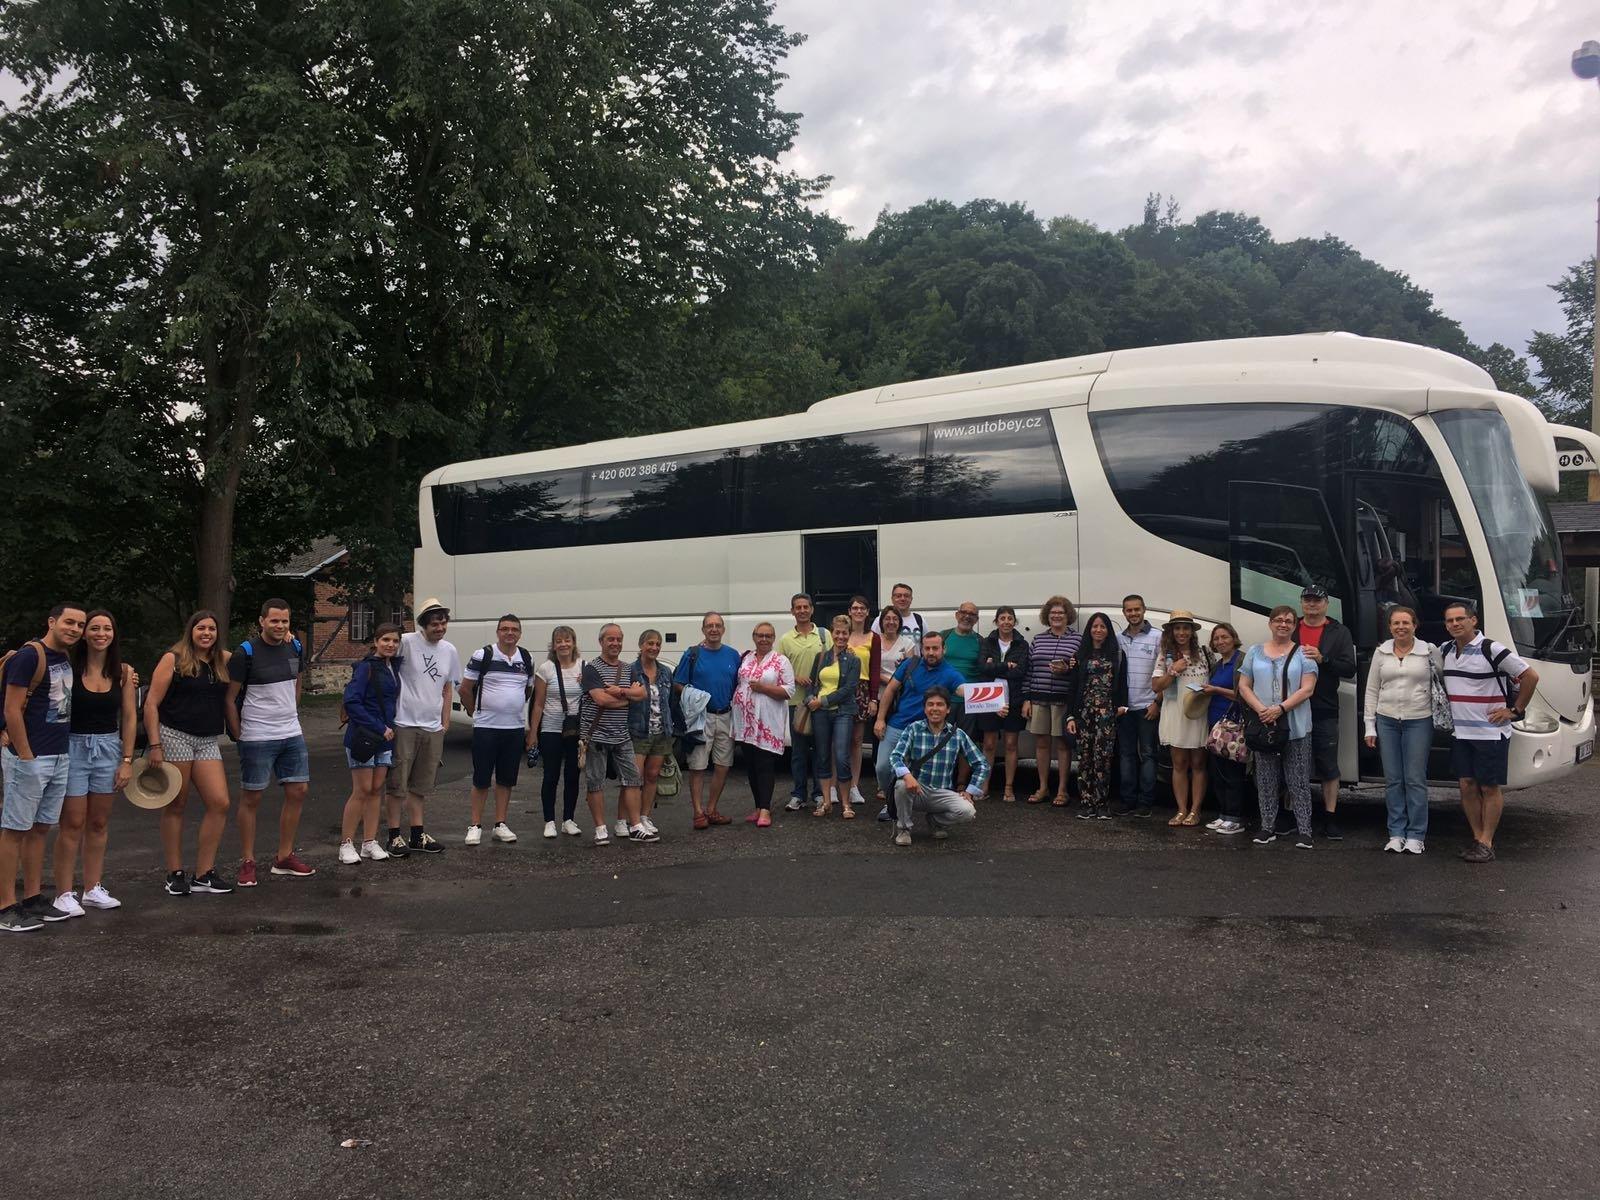 Bus de Dorado Tours - Gran Tour del Imperio Austrohúngaro, de camino a Austria